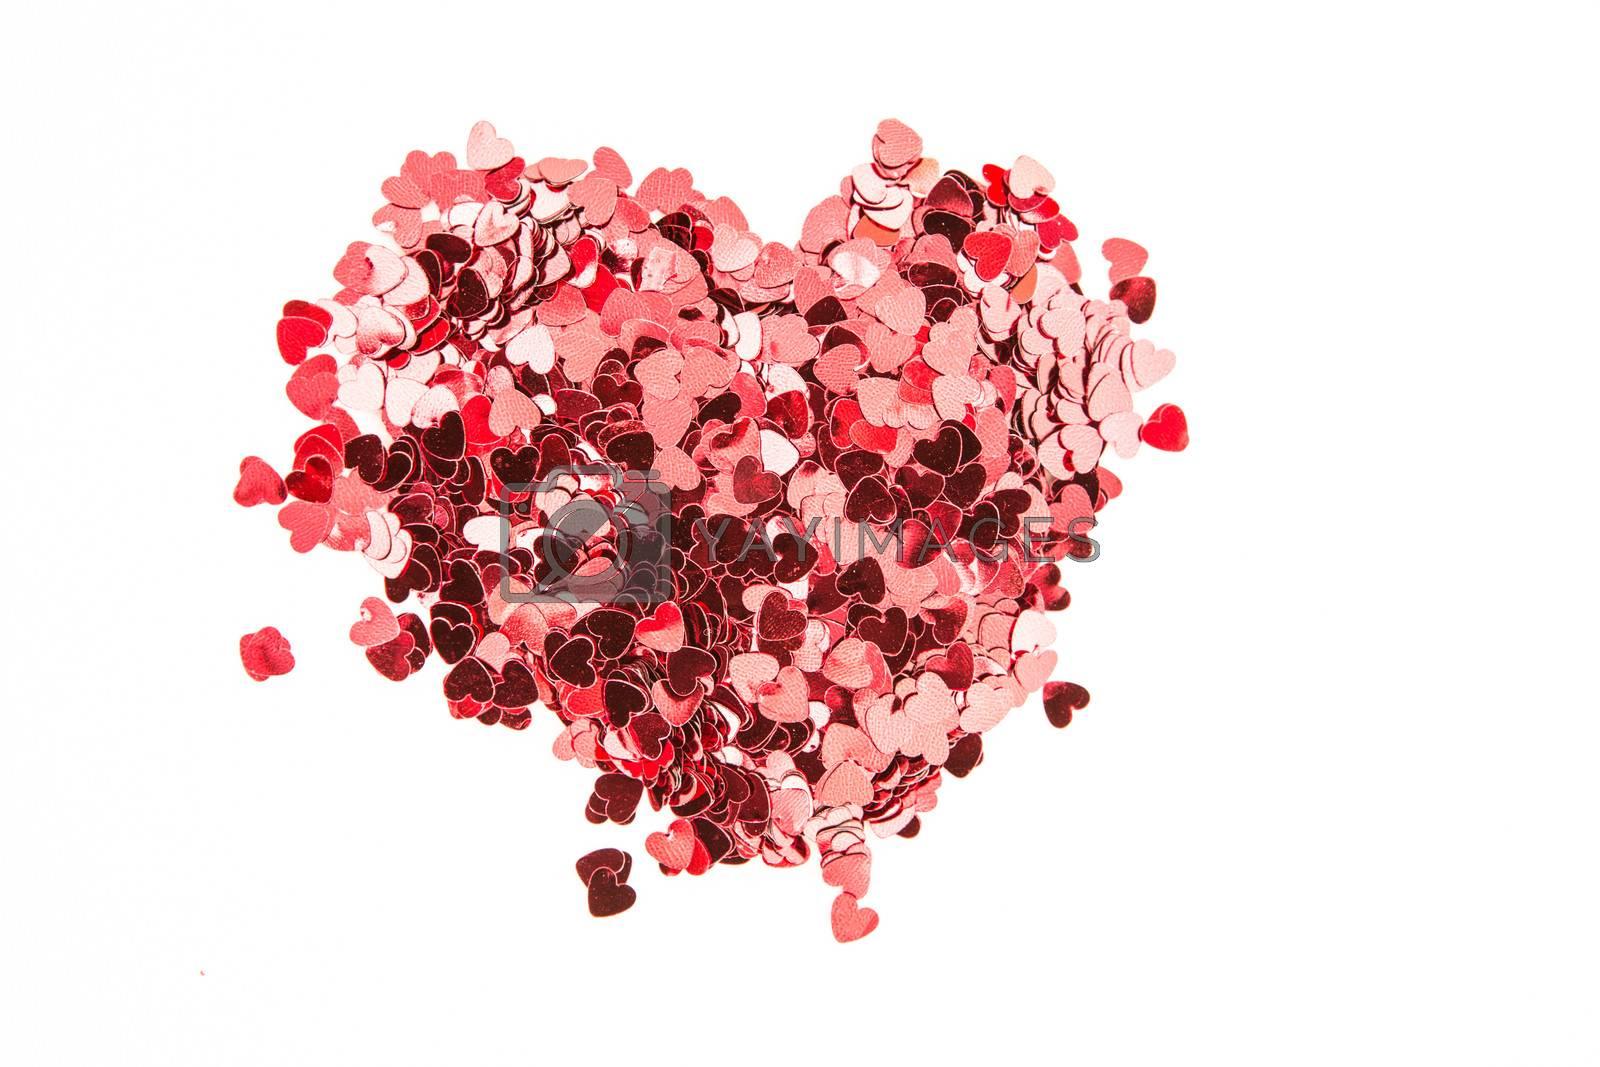 Valentines confetti on white background